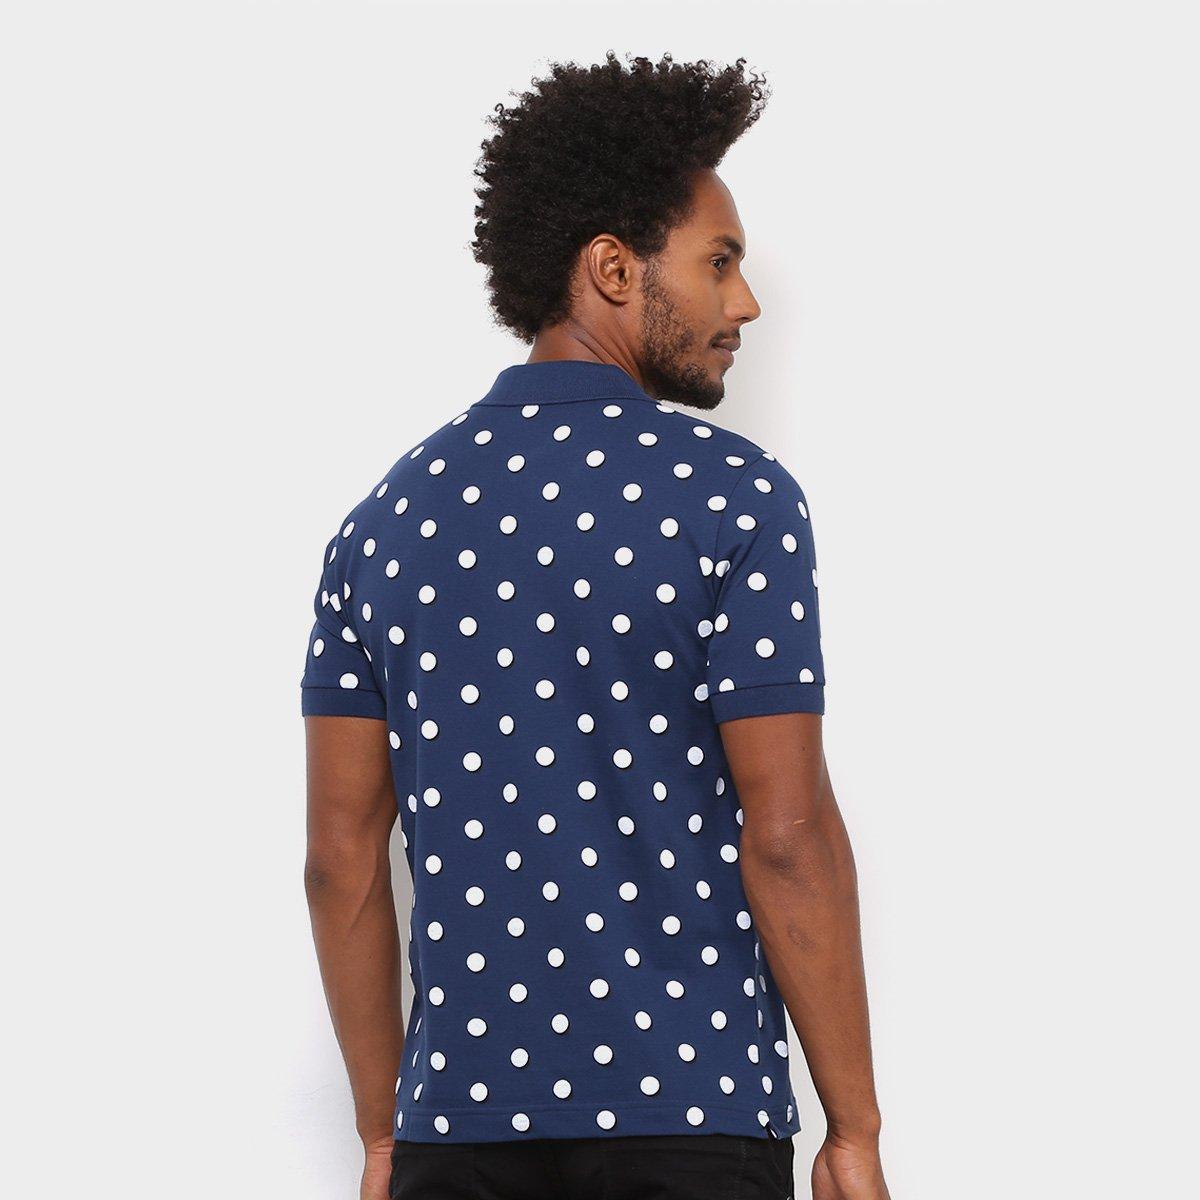 Camisa Polo Lacoste Live Piquet Full Print Masculino - Compre Agora ... 0ec3584b84